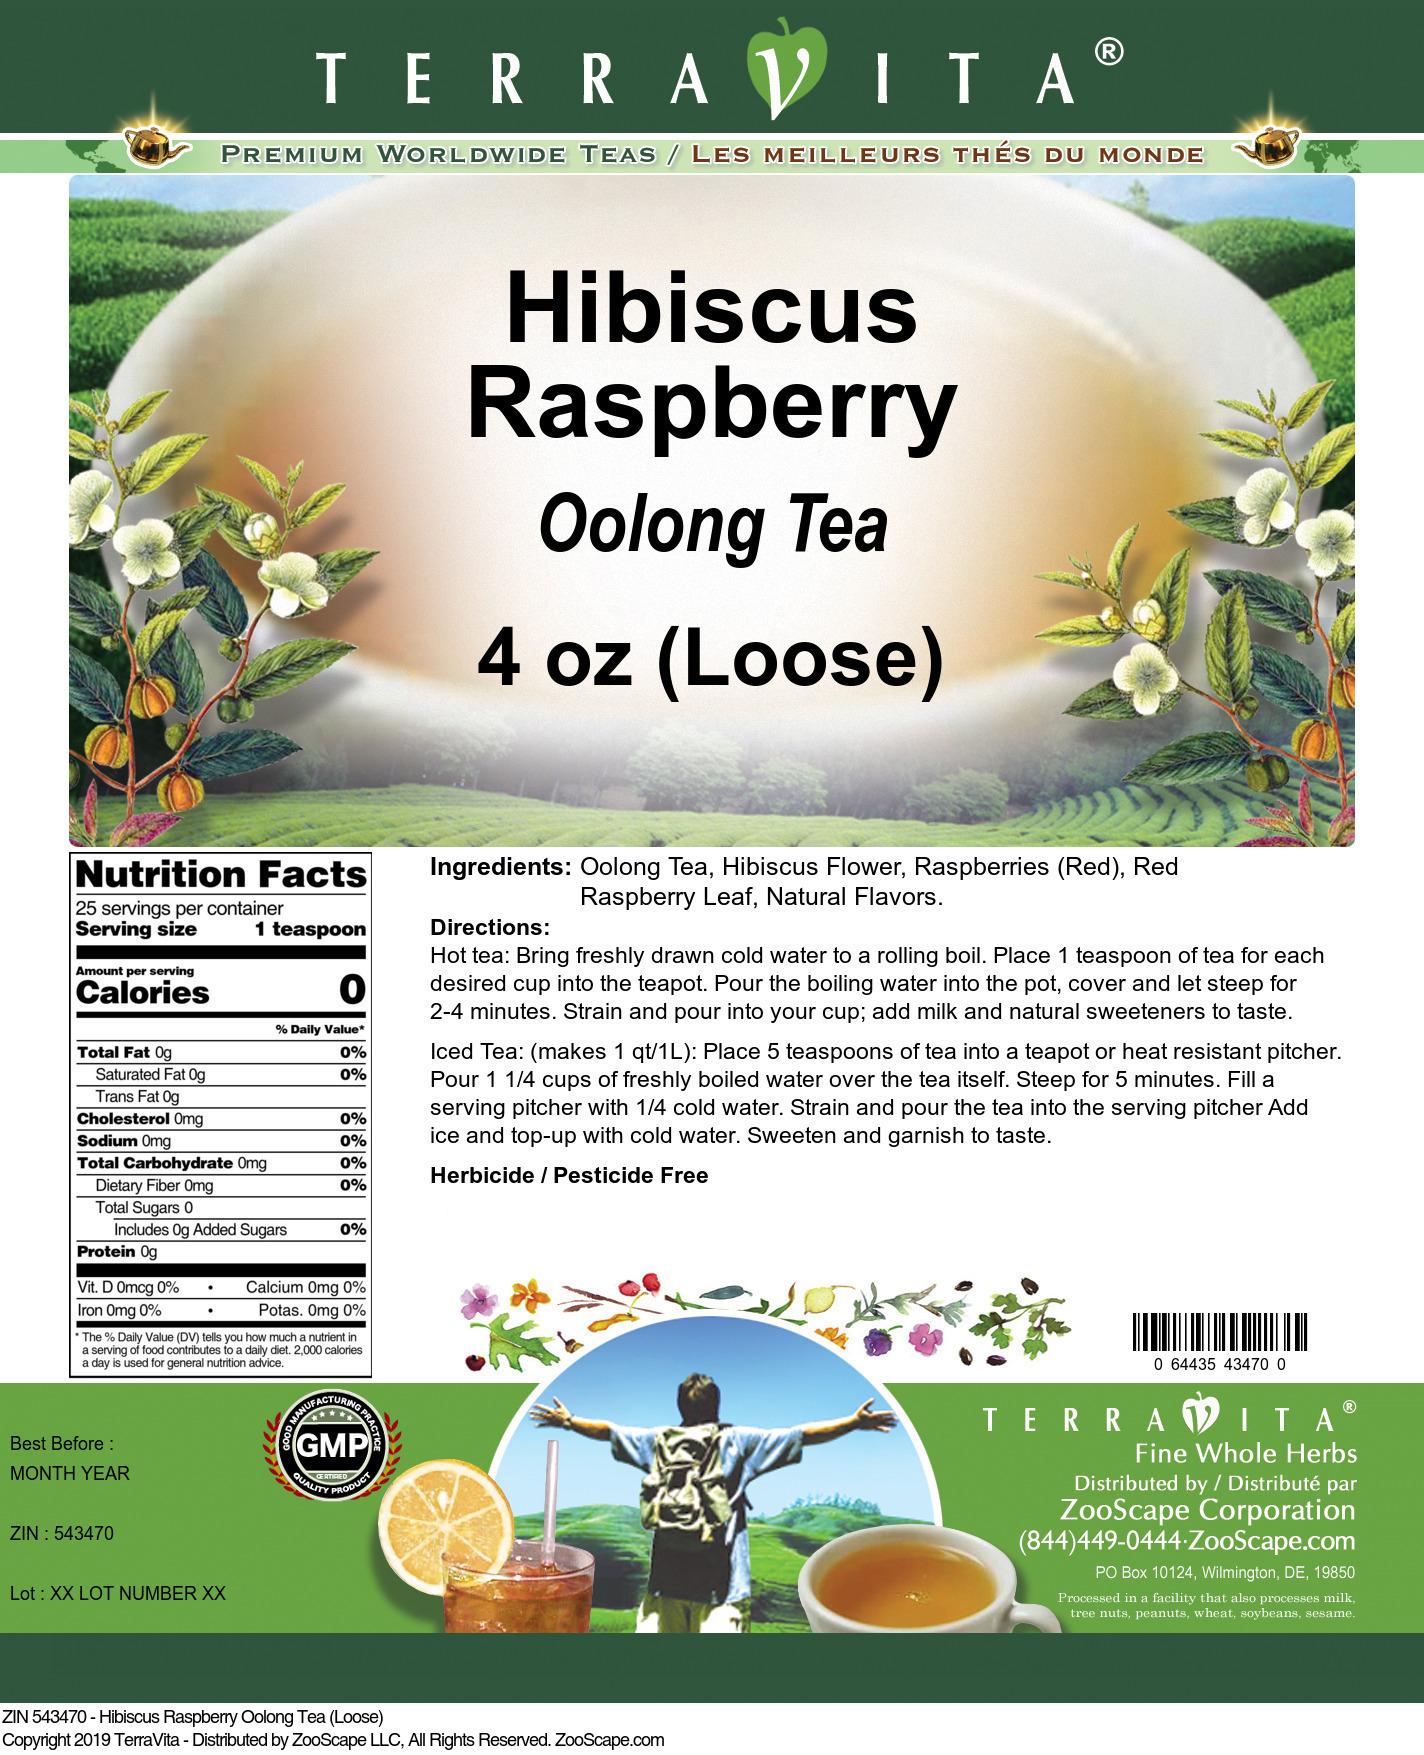 Hibiscus Raspberry Oolong Tea (Loose)